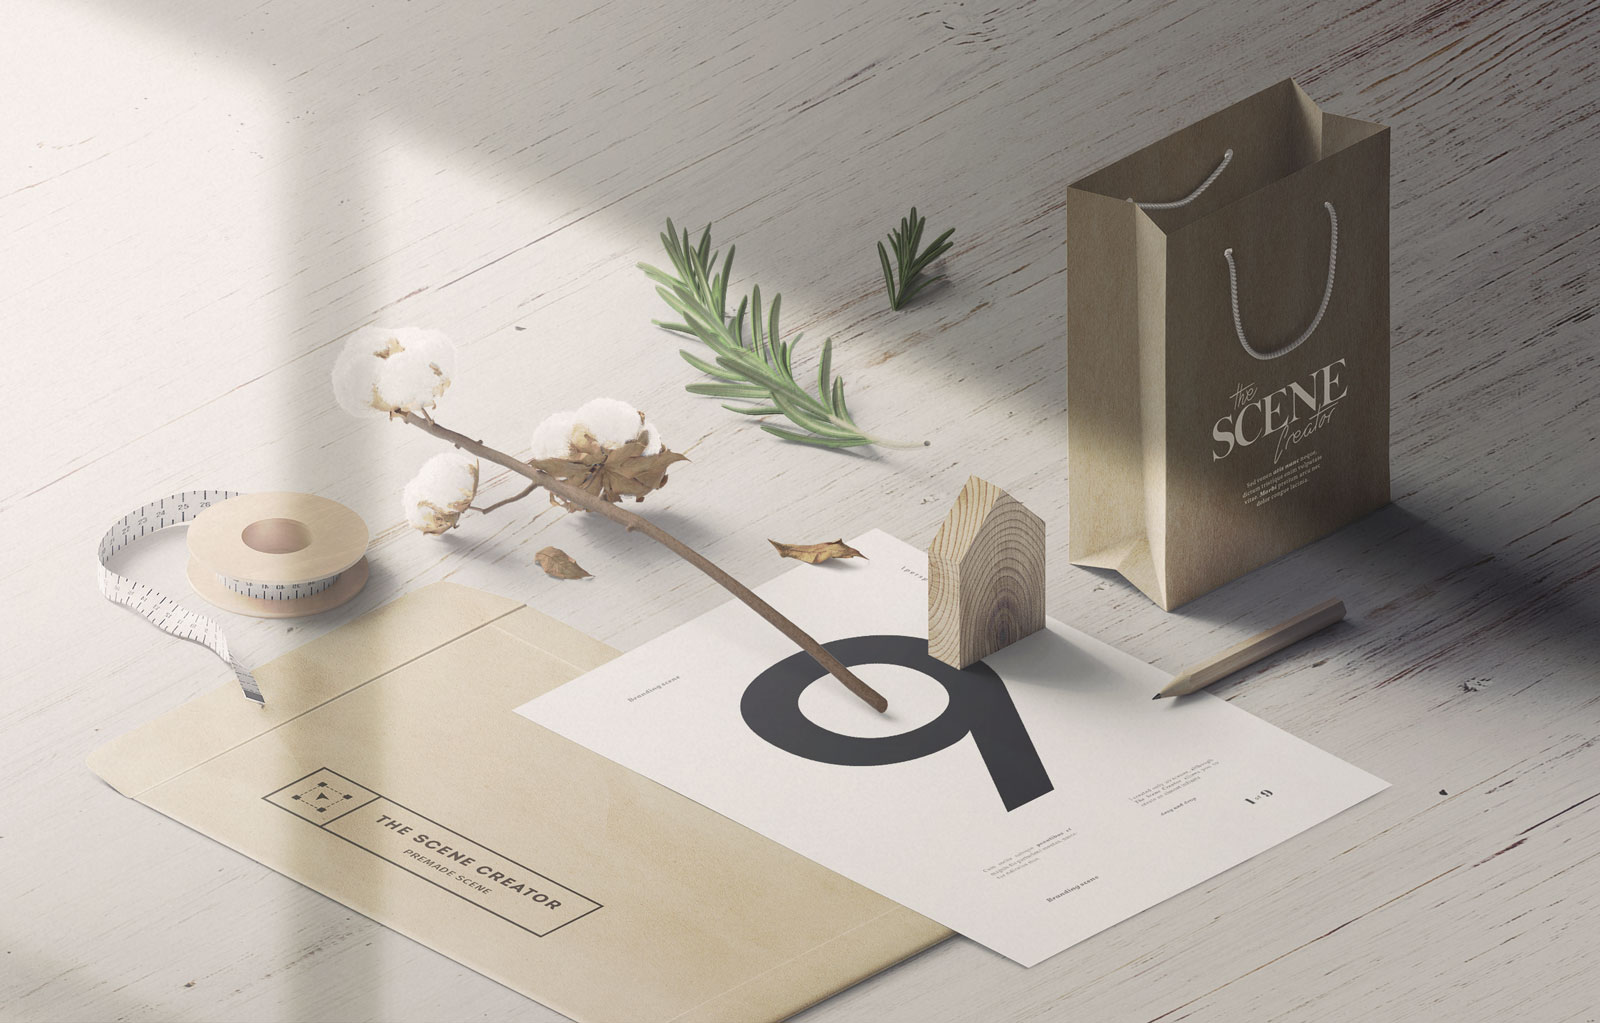 Free-Stationery-Perspective-Scene-Creator-PSD-Mockup-2